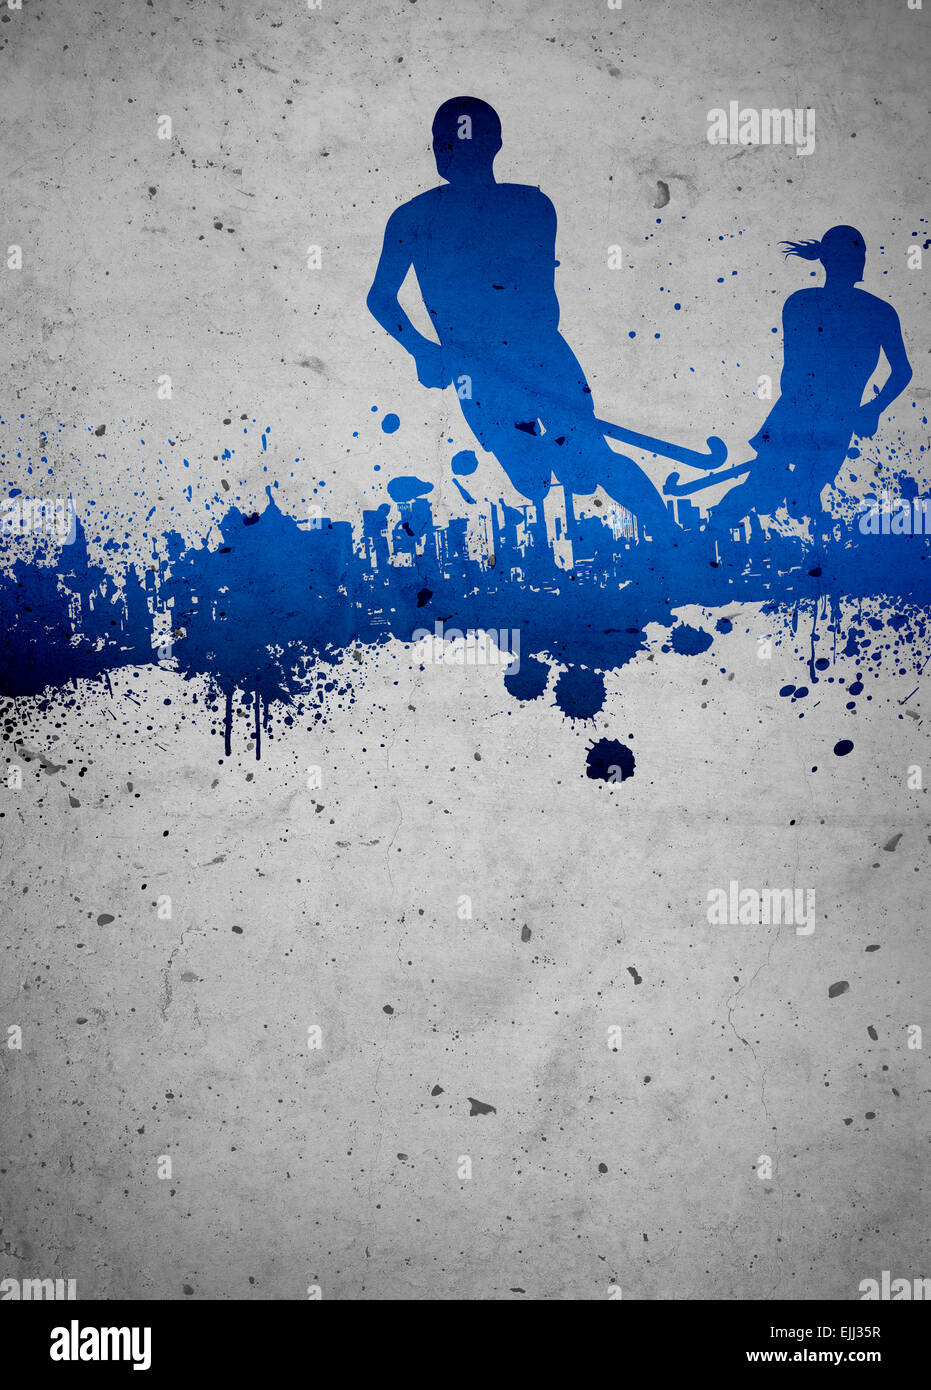 field hockey sport invitation poster or flyer background